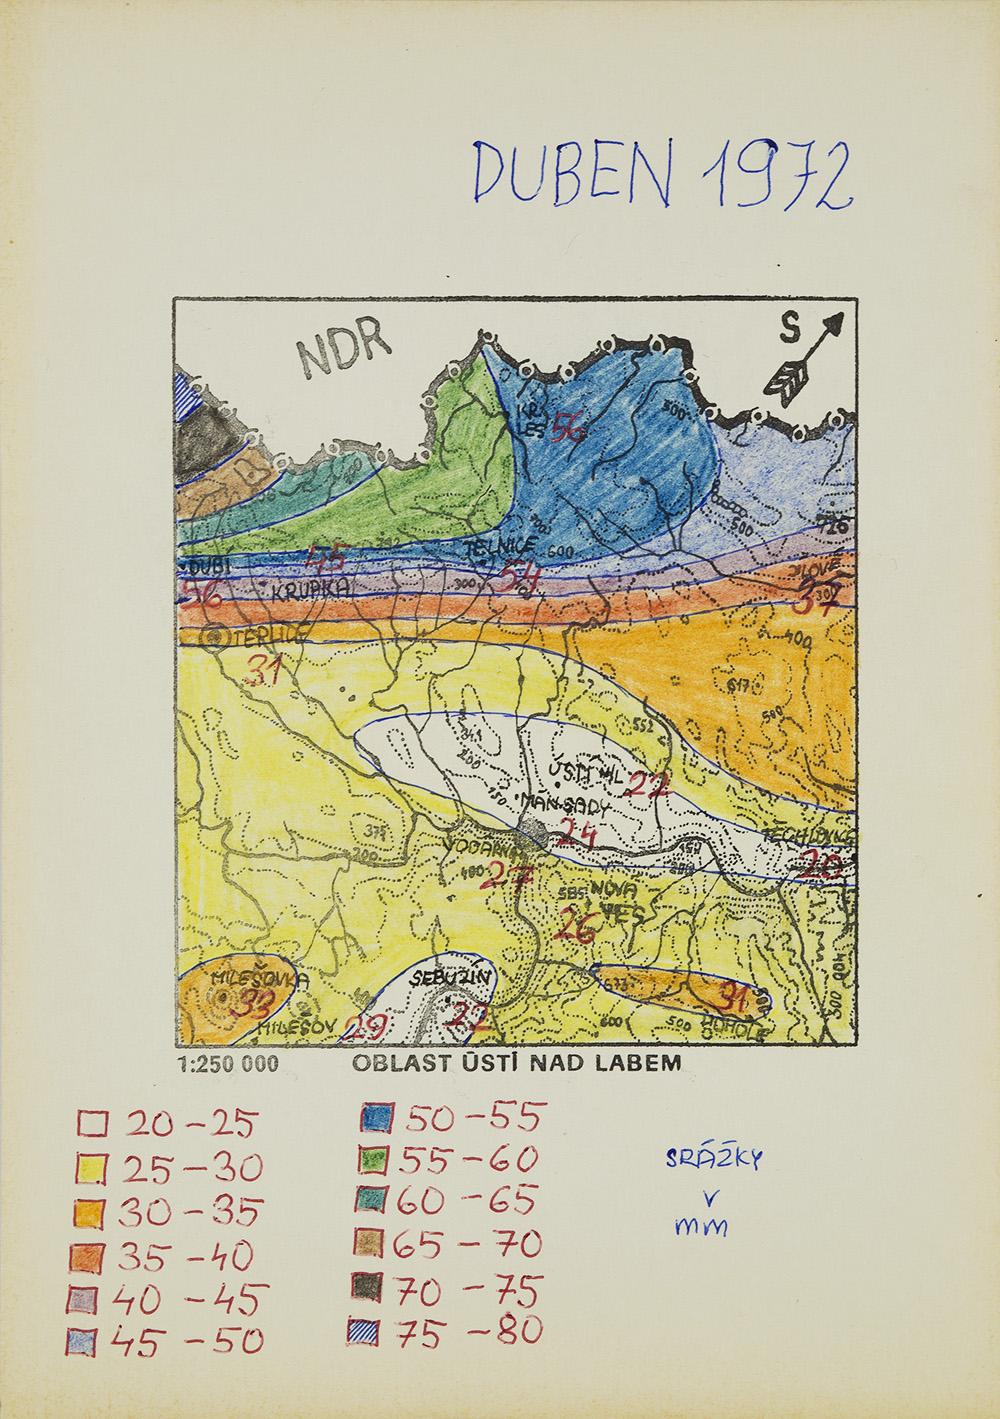 Zdenek Kosek    Duben 1972  , c. 1991 Ballpoint pen/ marker, paper 8.25 x 6 in (21.0 x 15.2 cm) ZKo 70